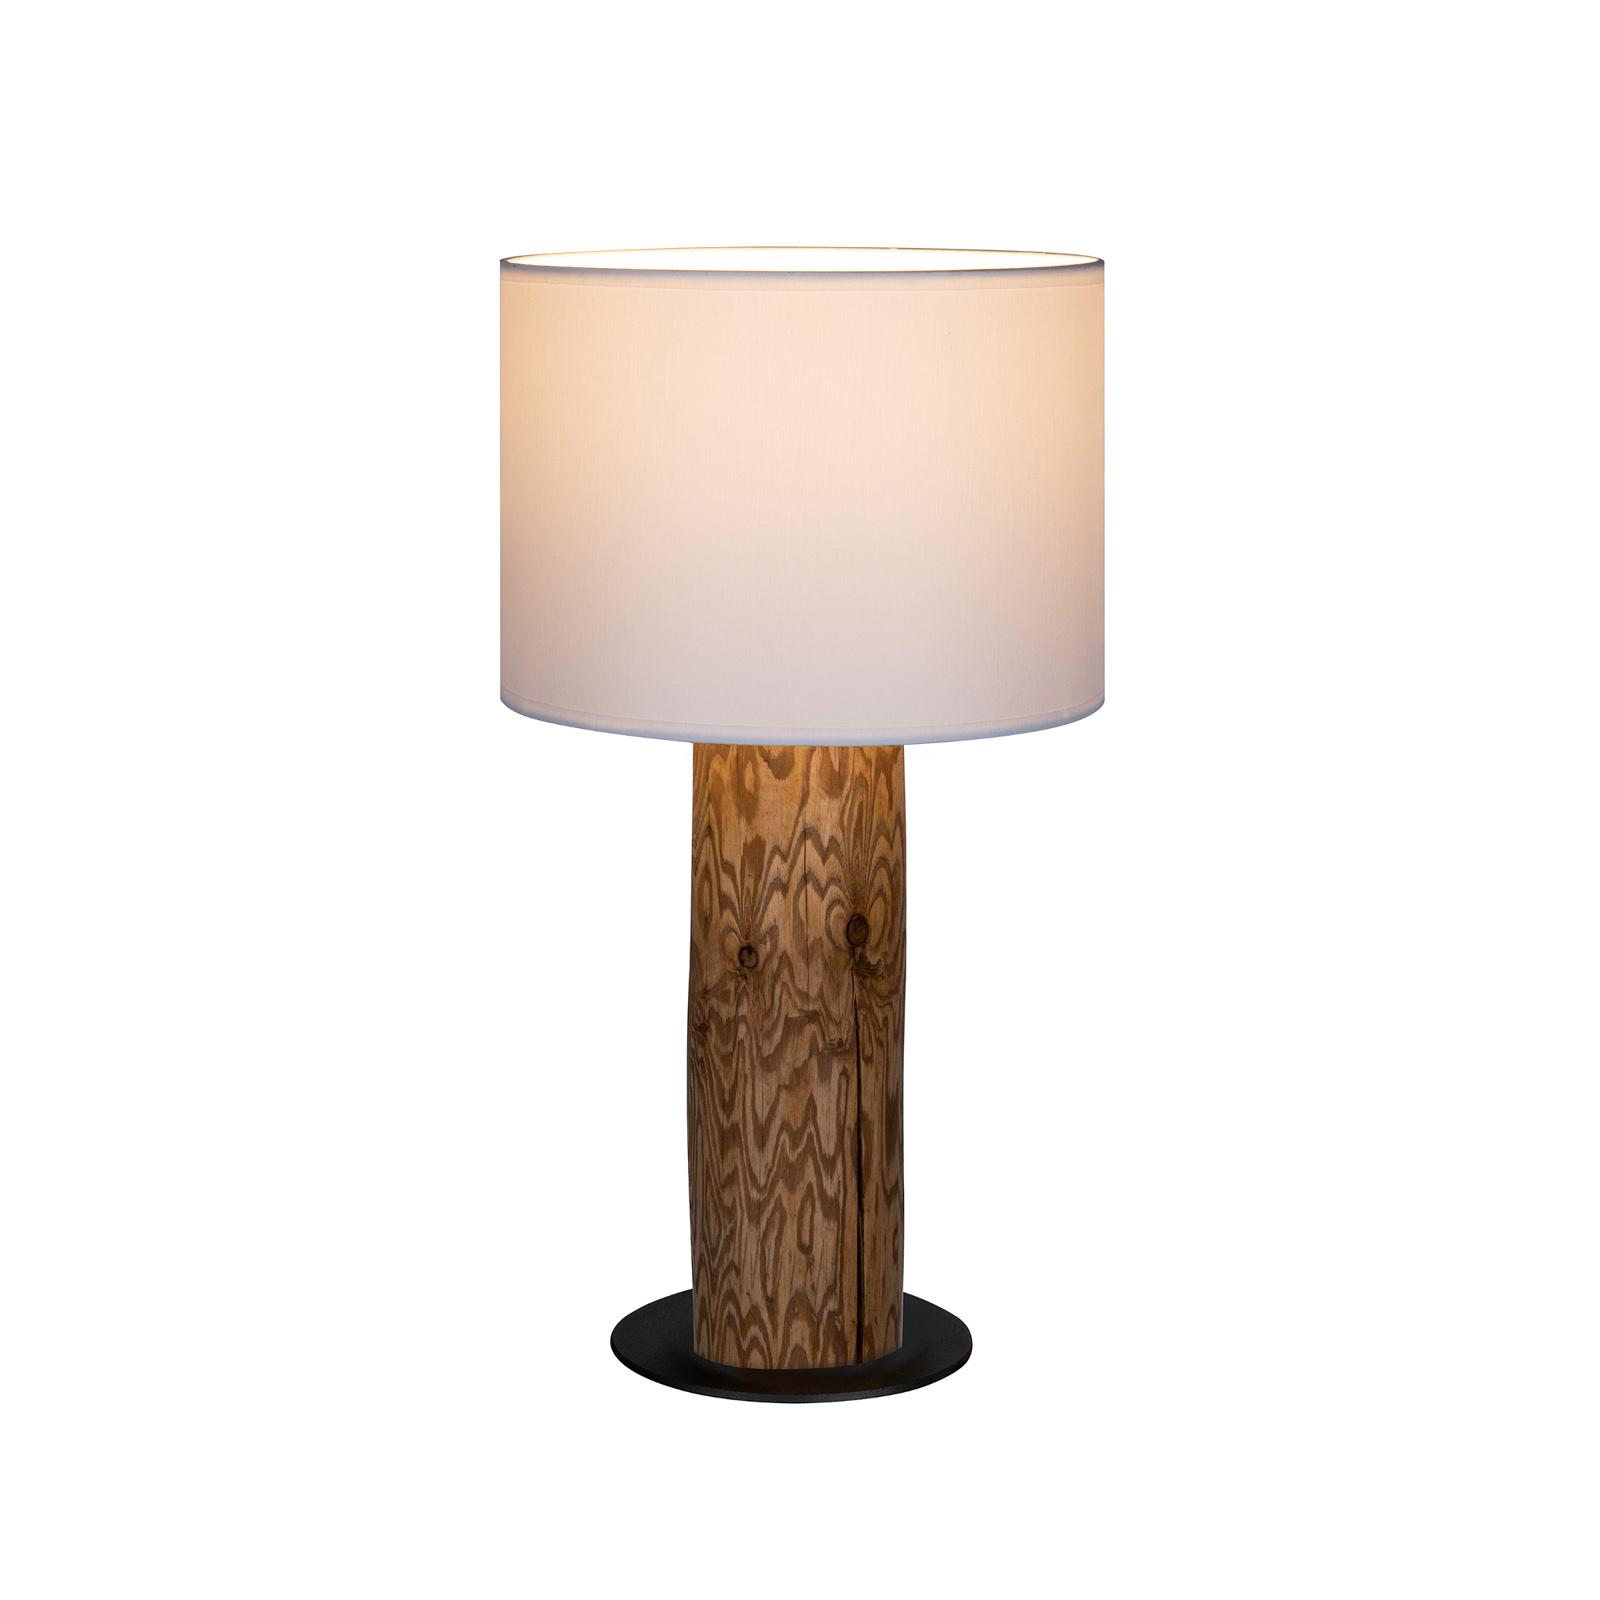 Pino Simpel bordlampe, hvid skærm, brun fod